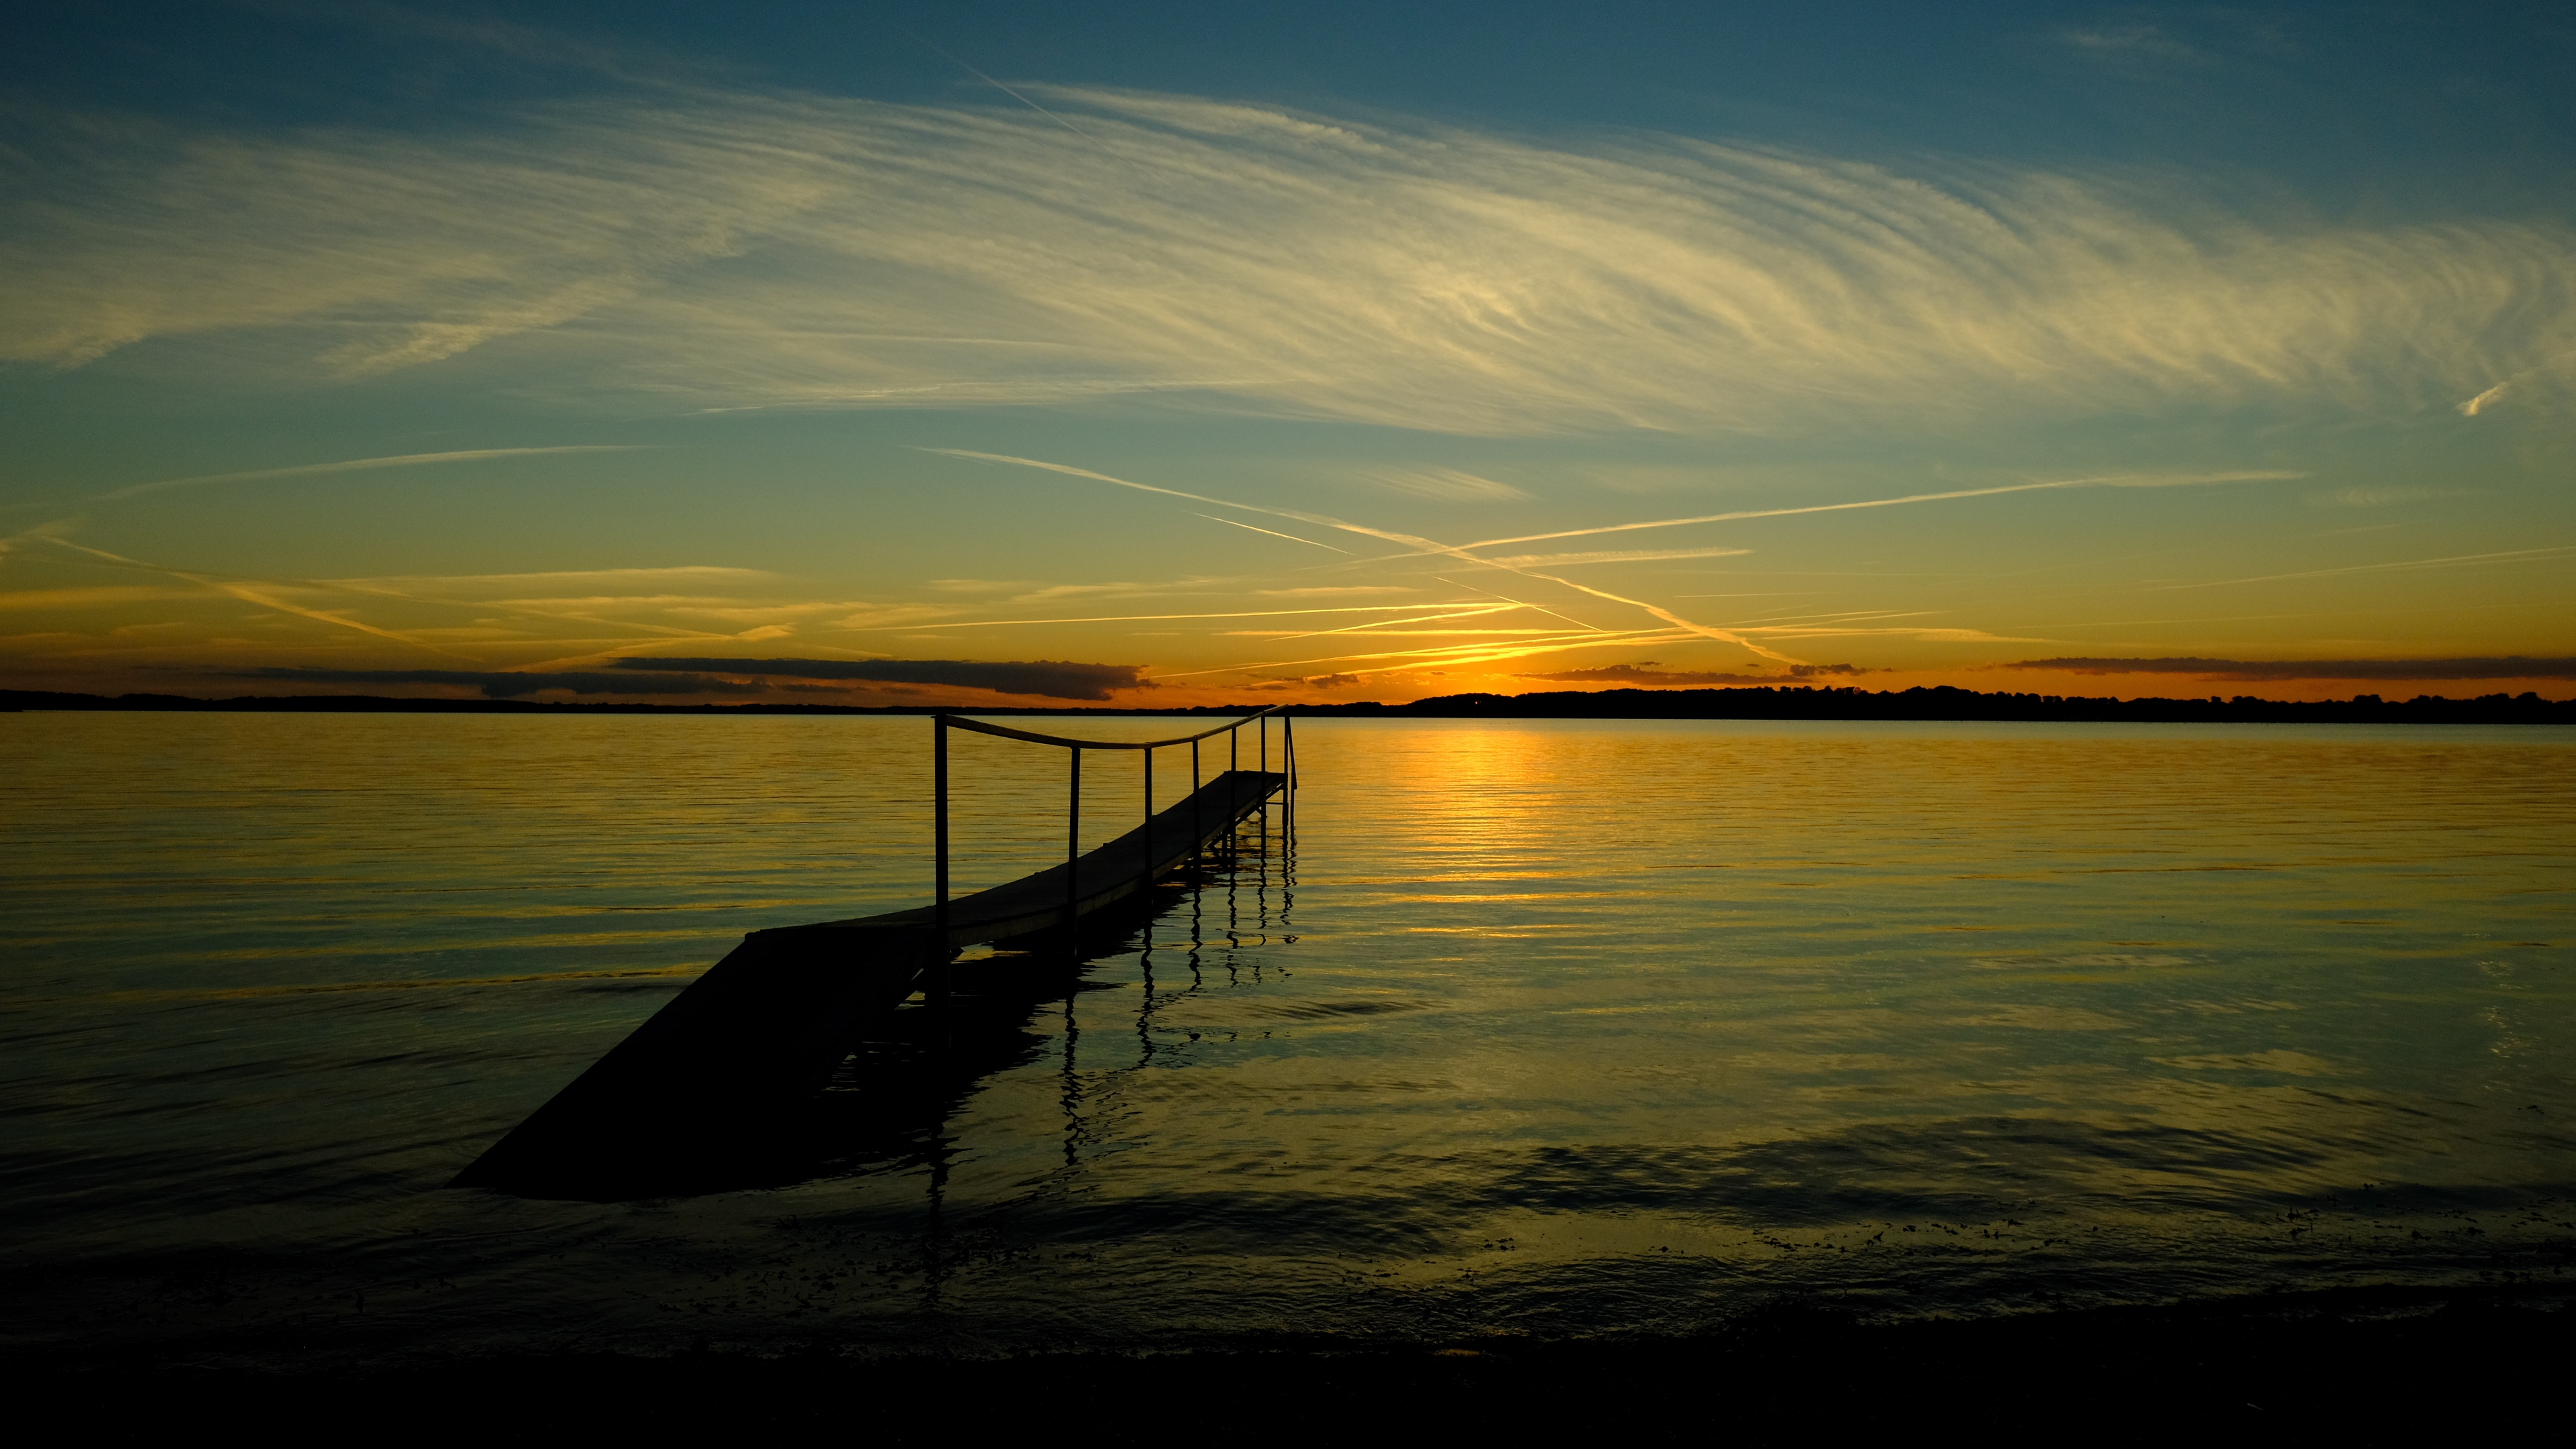 bridge sea sunset horizon river pier shore sky 4k 1541116815 - bridge, sea, sunset, horizon, river, pier, shore, sky 4k - sunset, Sea, bridge